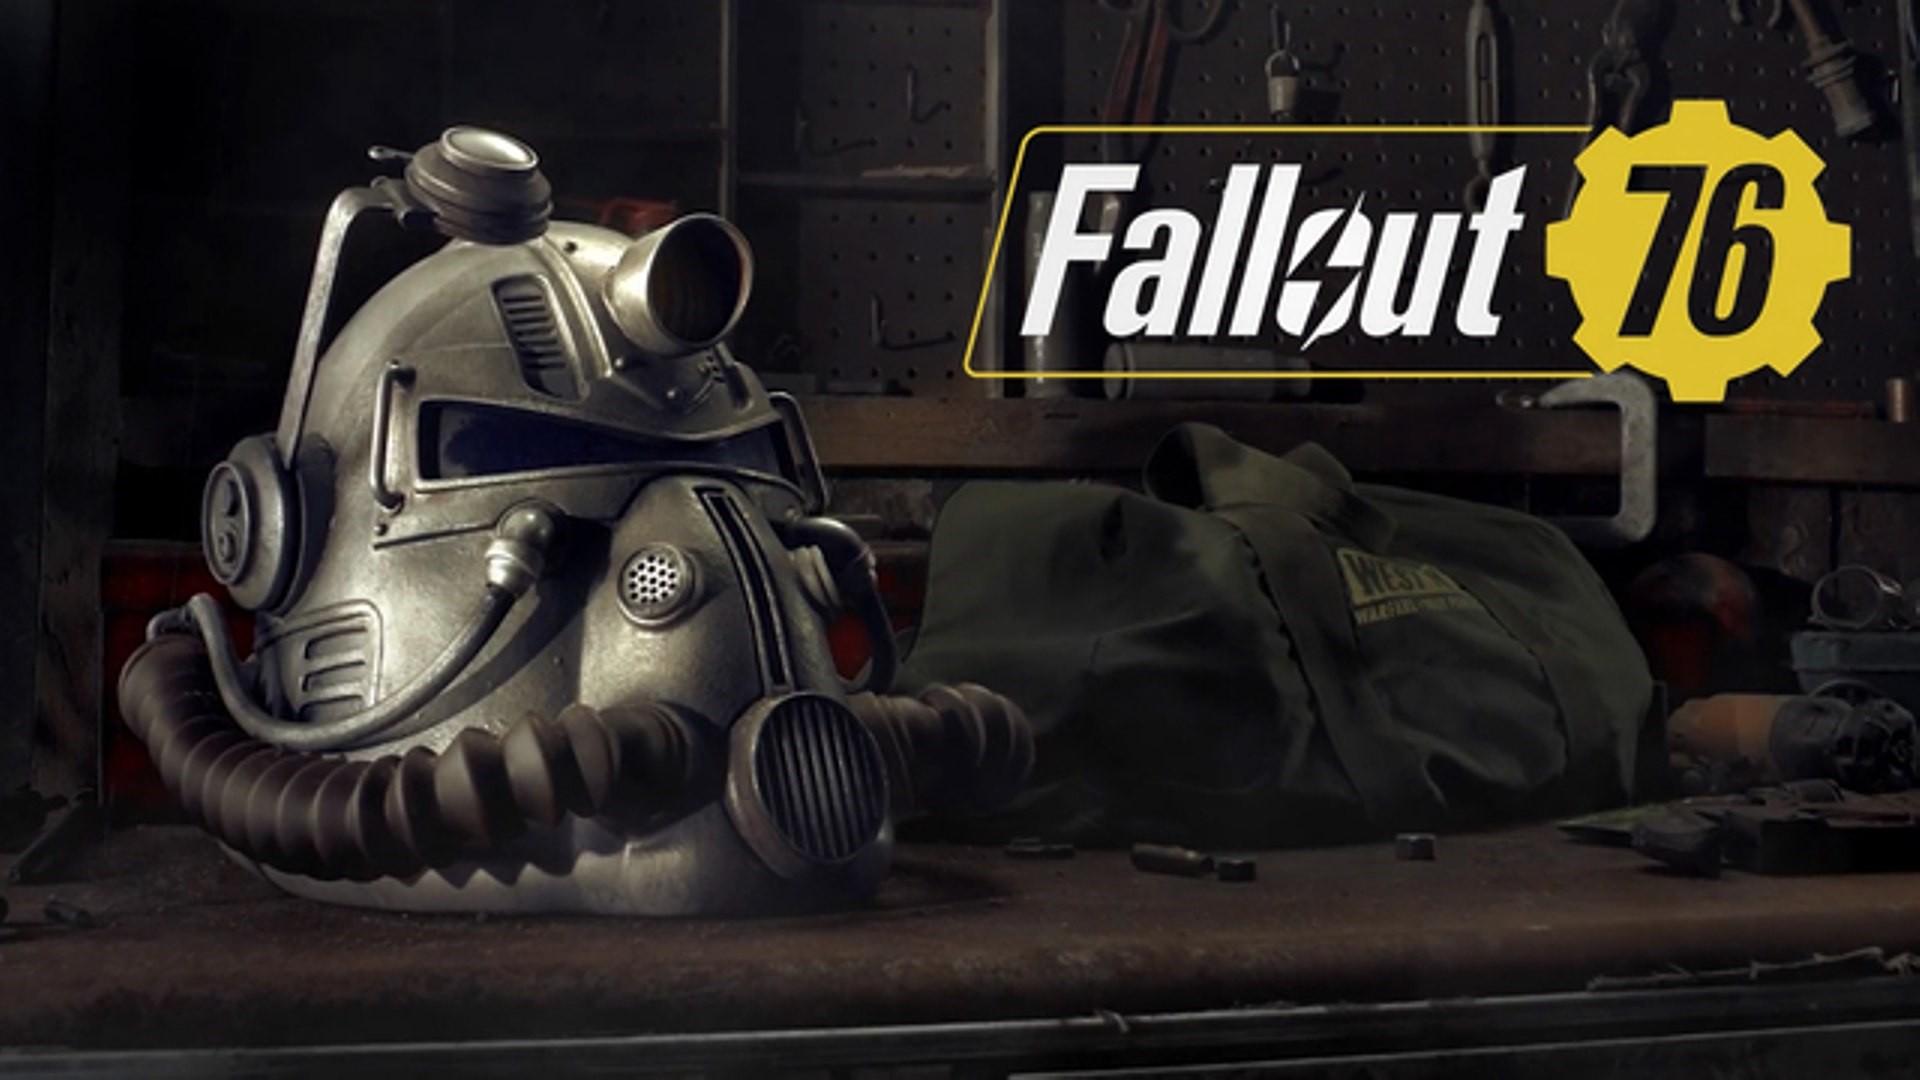 Fallout 76 Desktop wallpaper